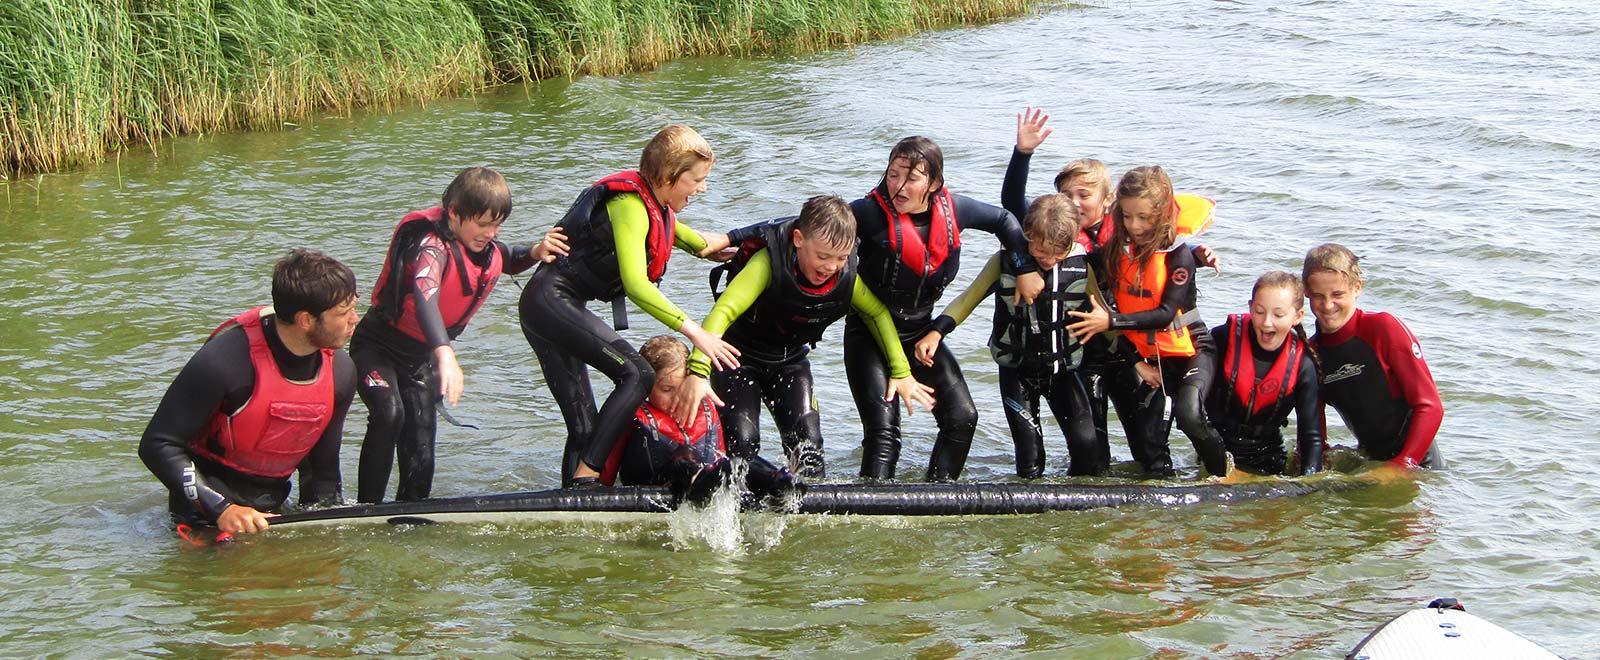 kids watersports summer camp fun